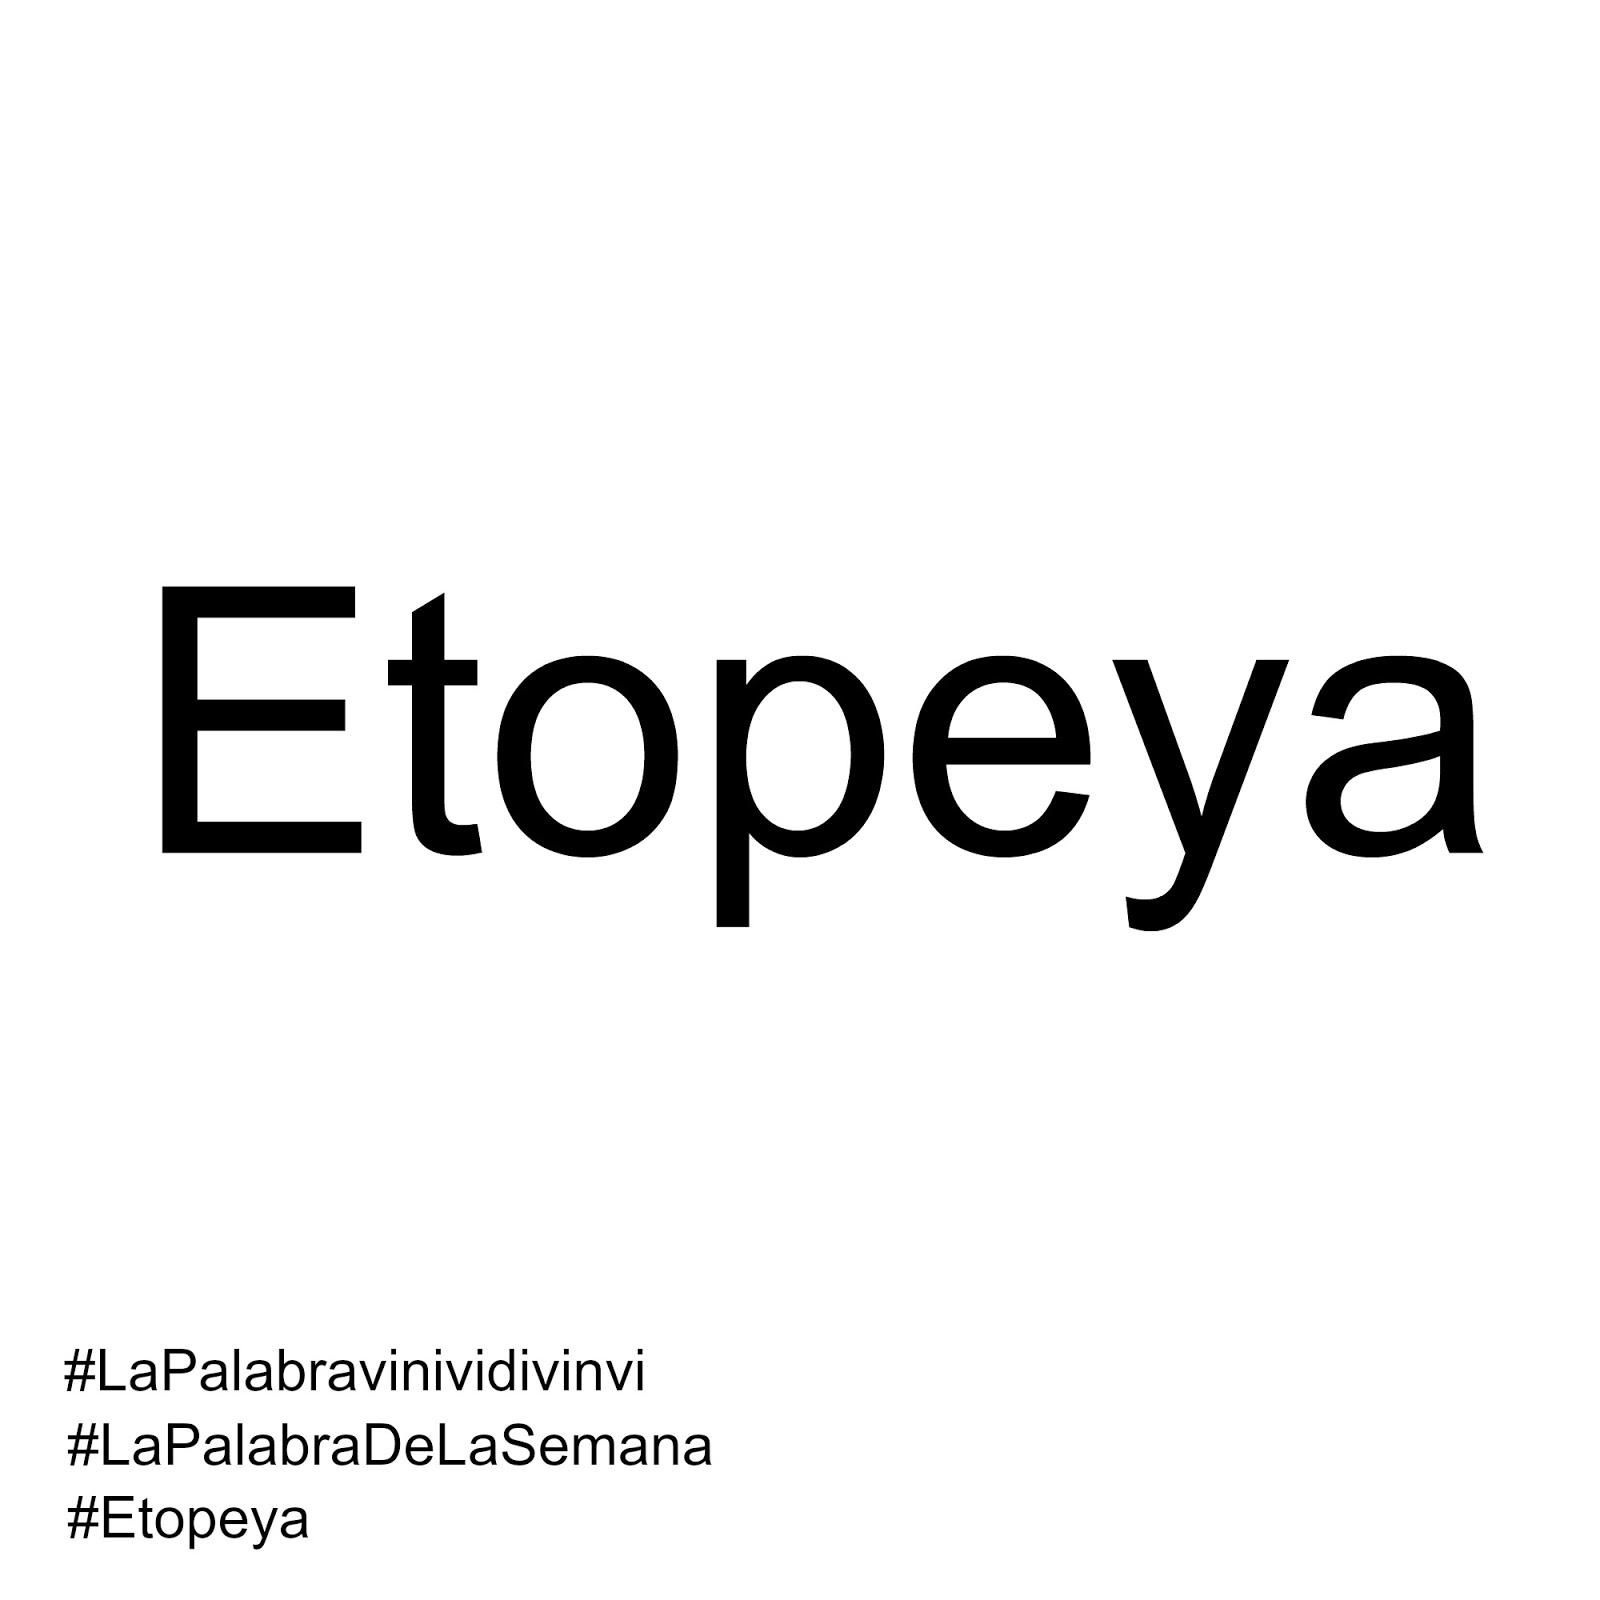 #lapalabravinividivinvi #lapalabradelasemana #etopeya